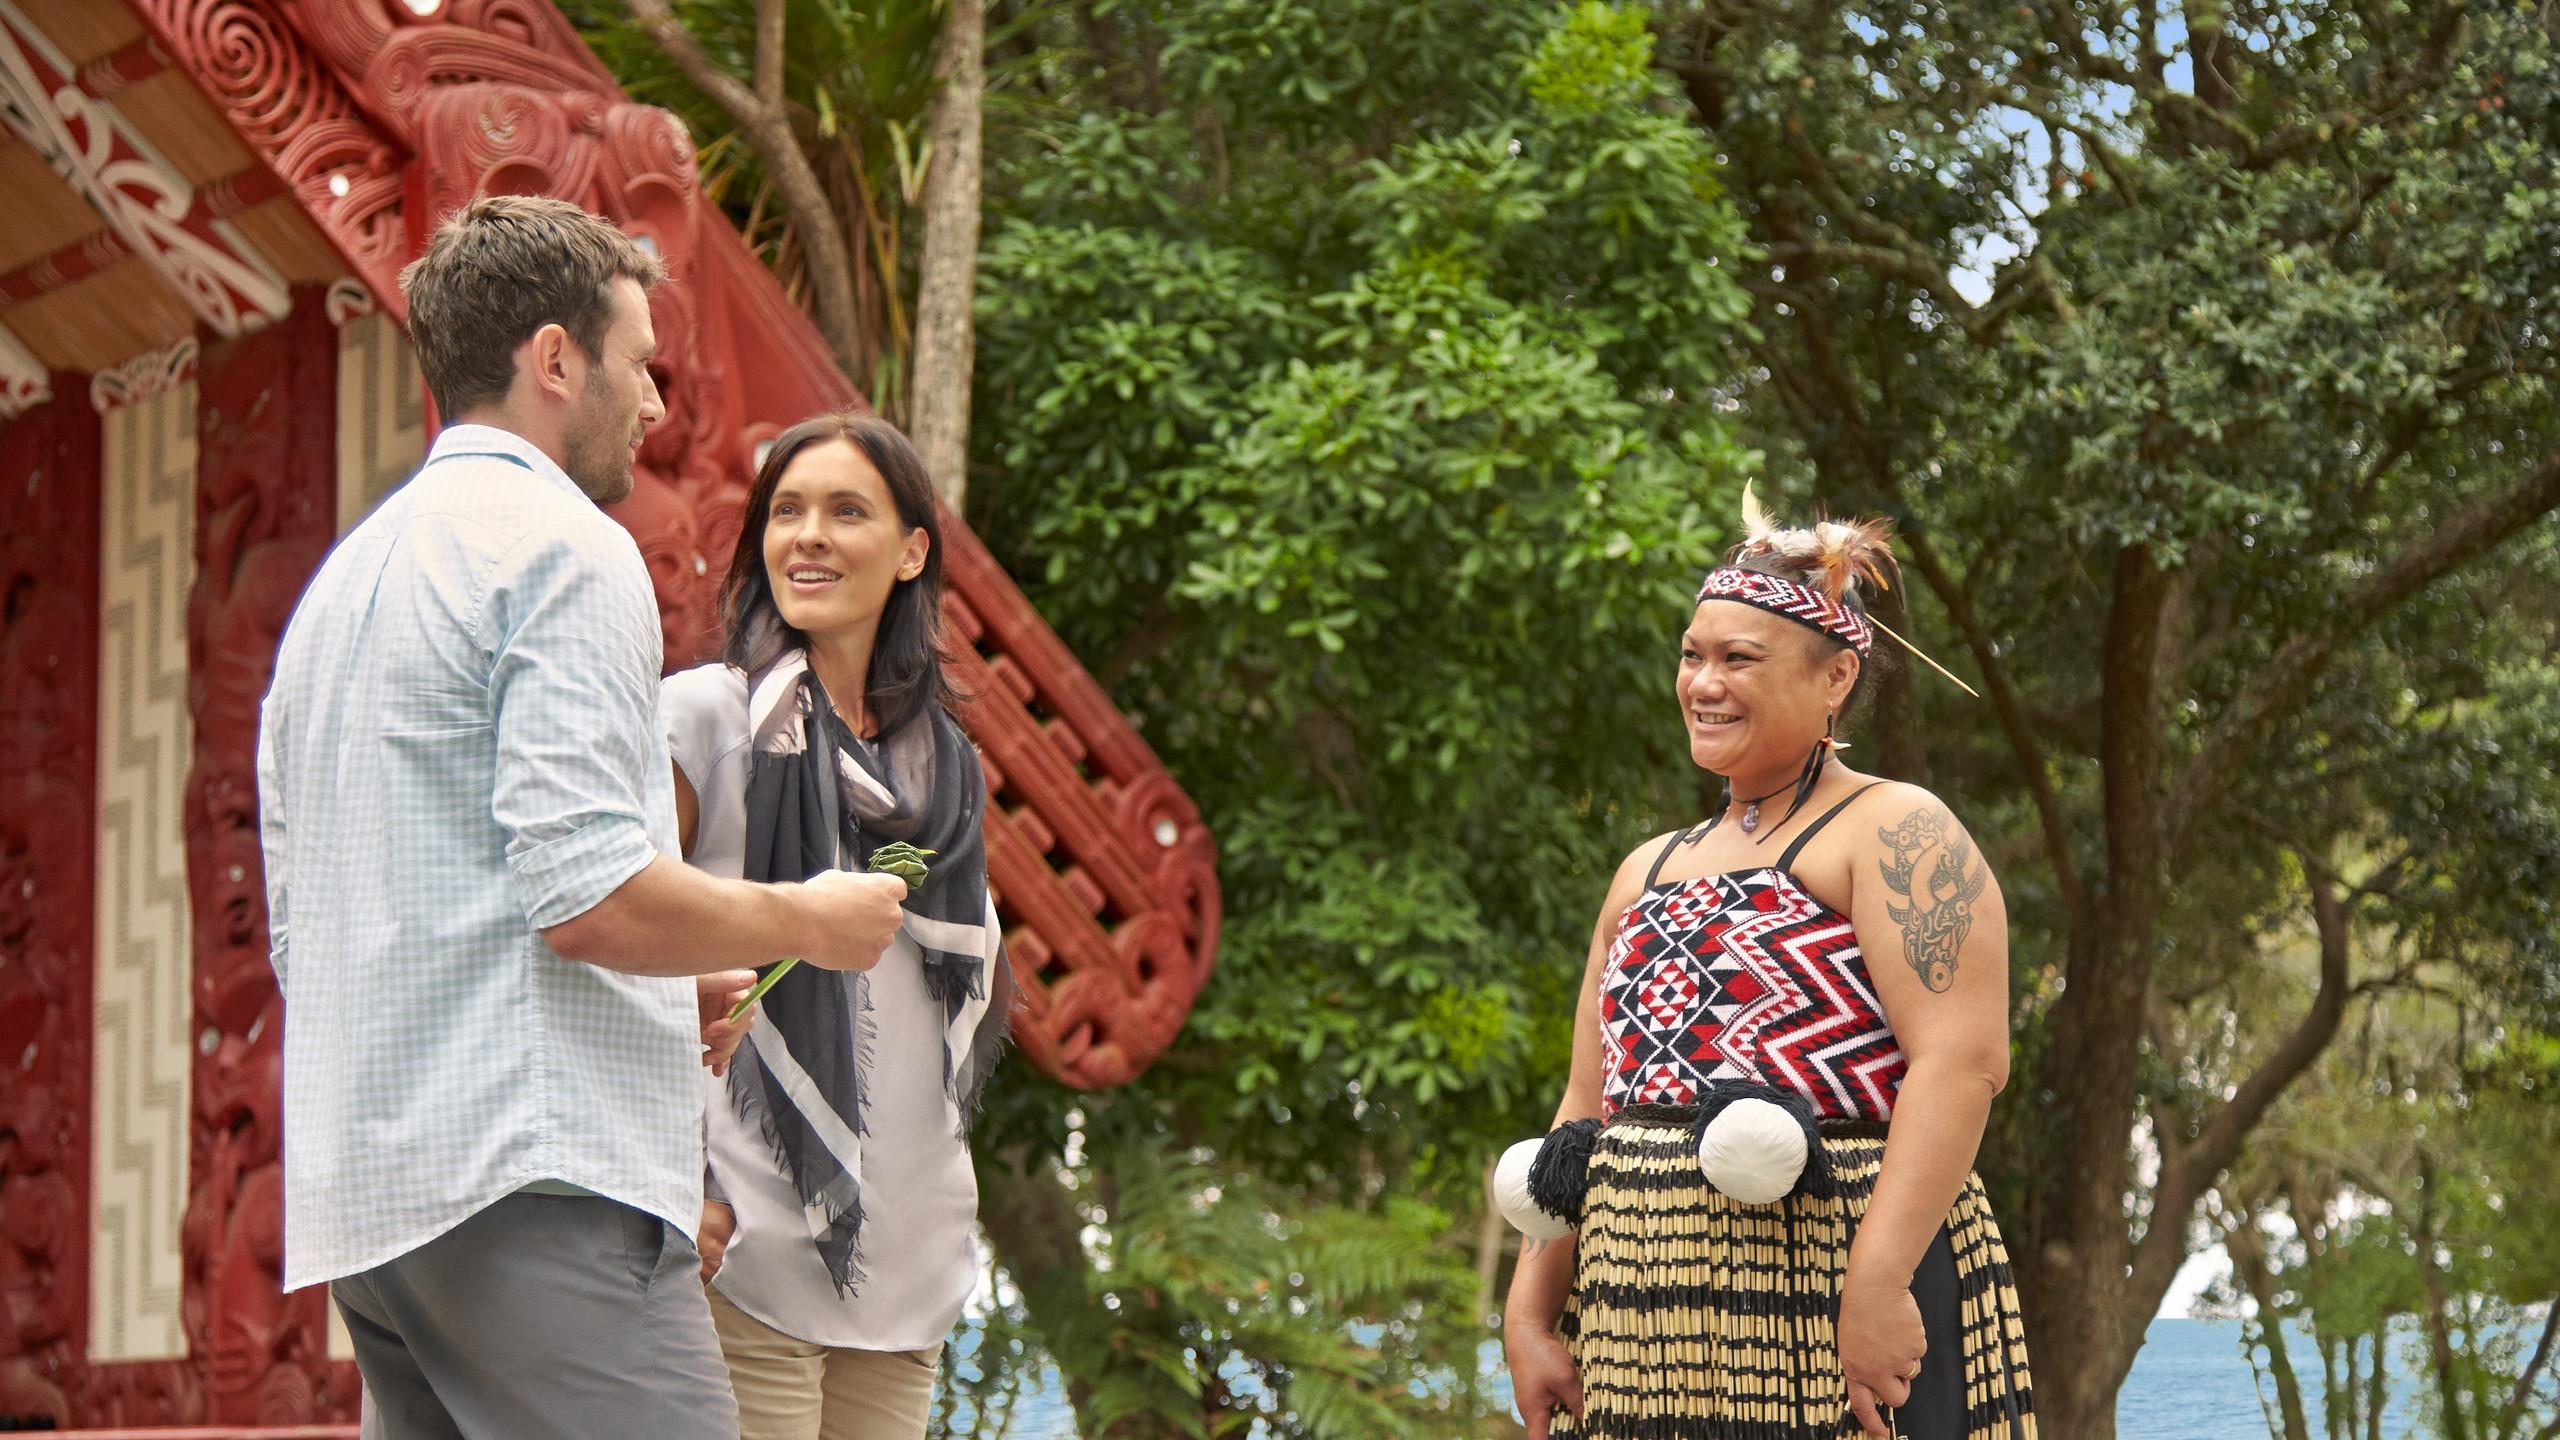 Деревня Вайтанги, Новая Зеландия